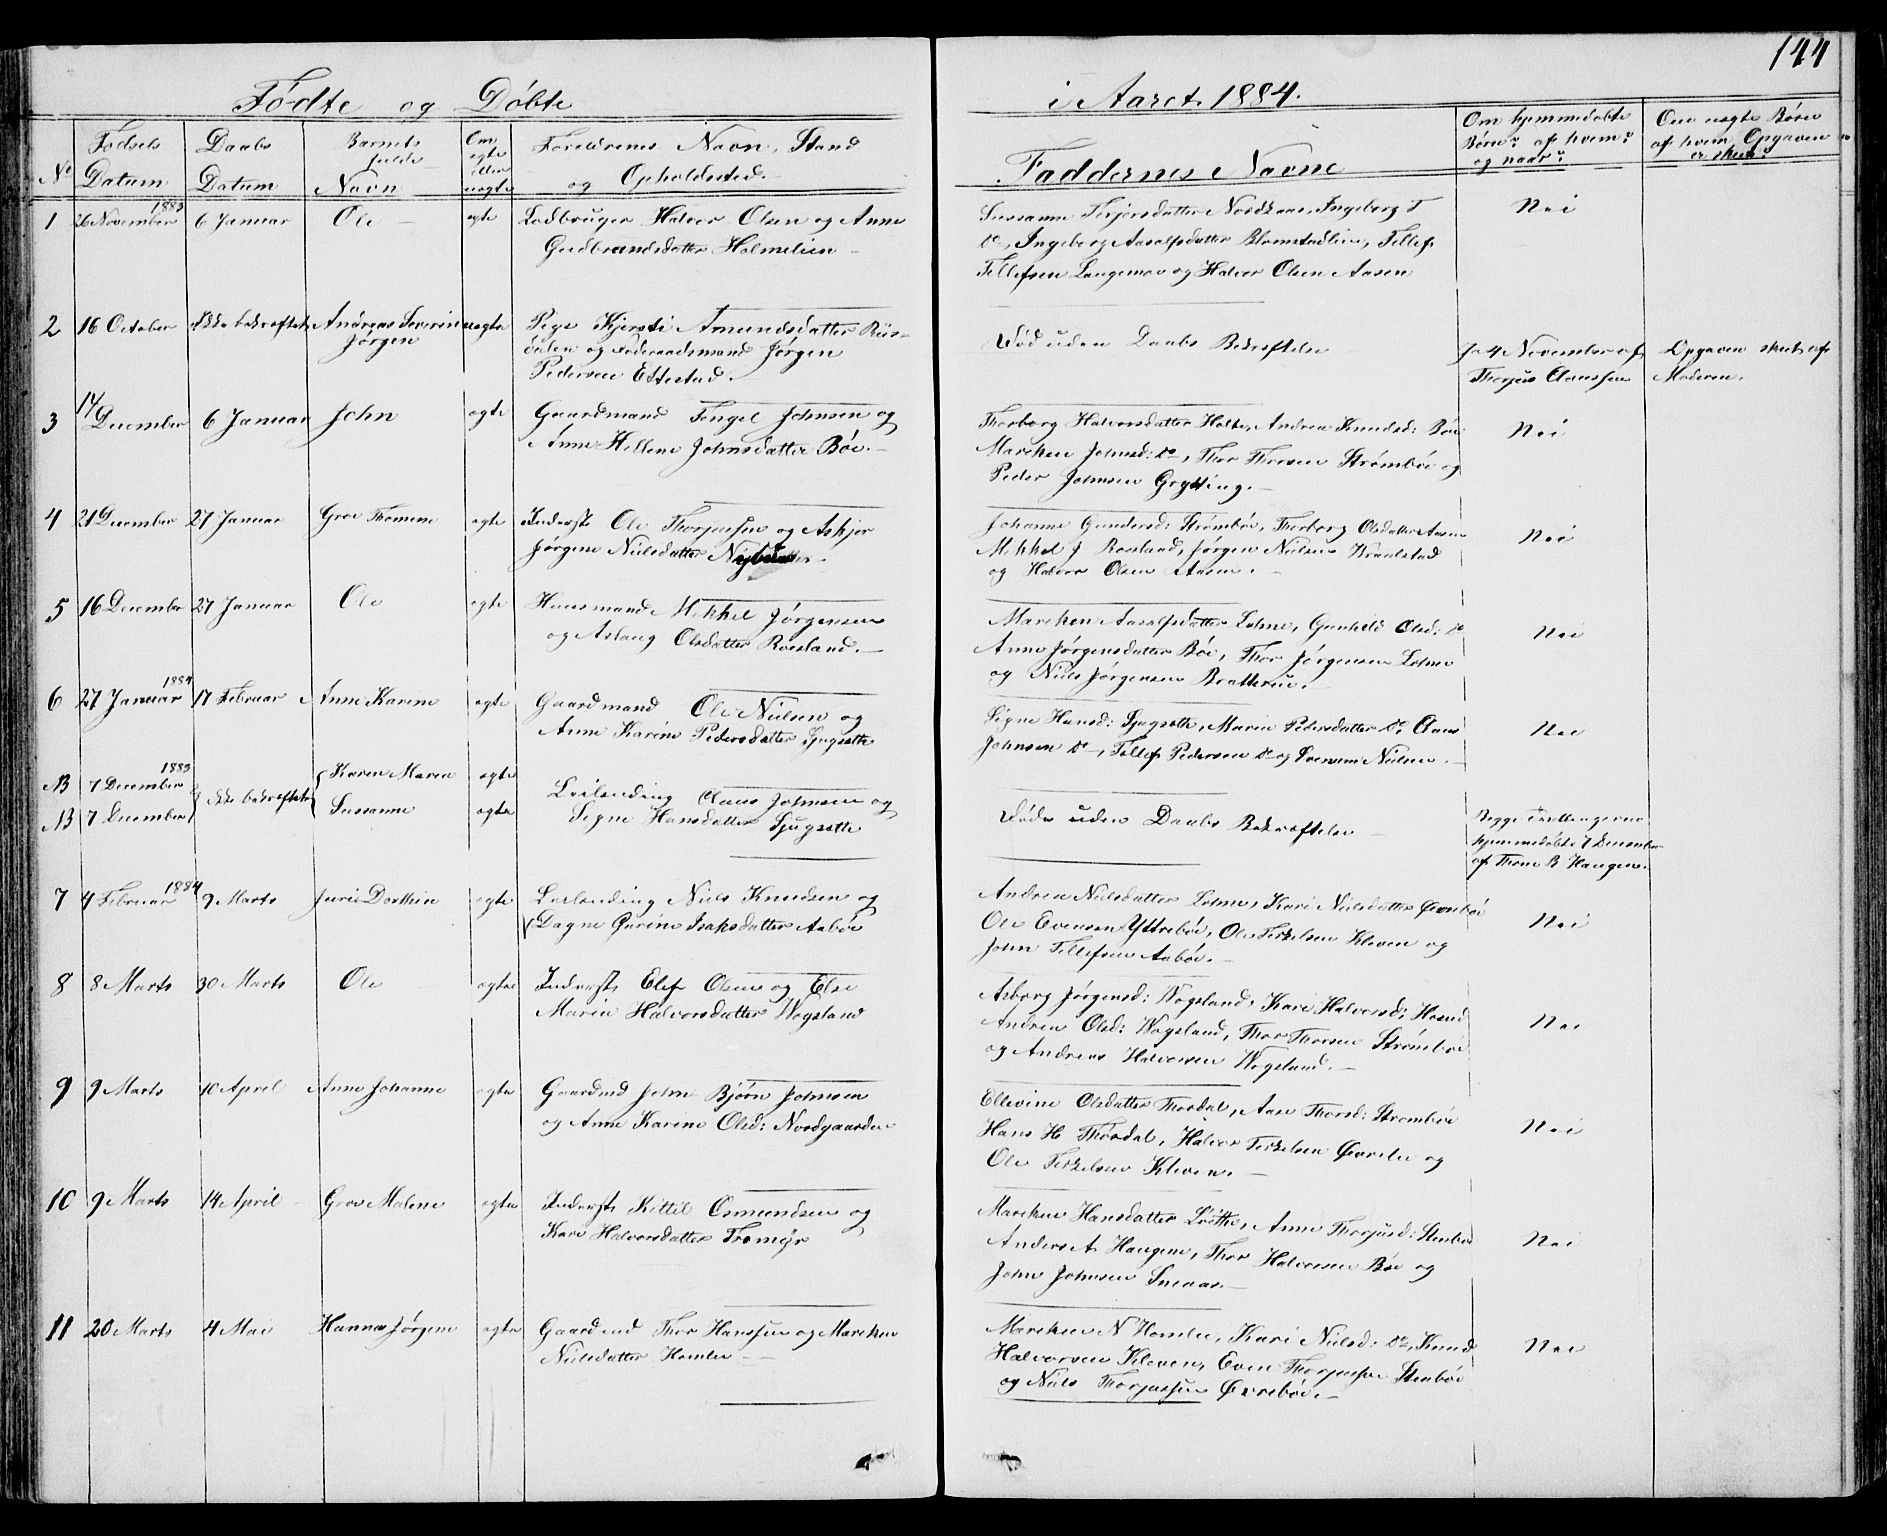 SAKO, Drangedal kirkebøker, G/Gb/L0001: Klokkerbok nr. II 1, 1856-1894, s. 144